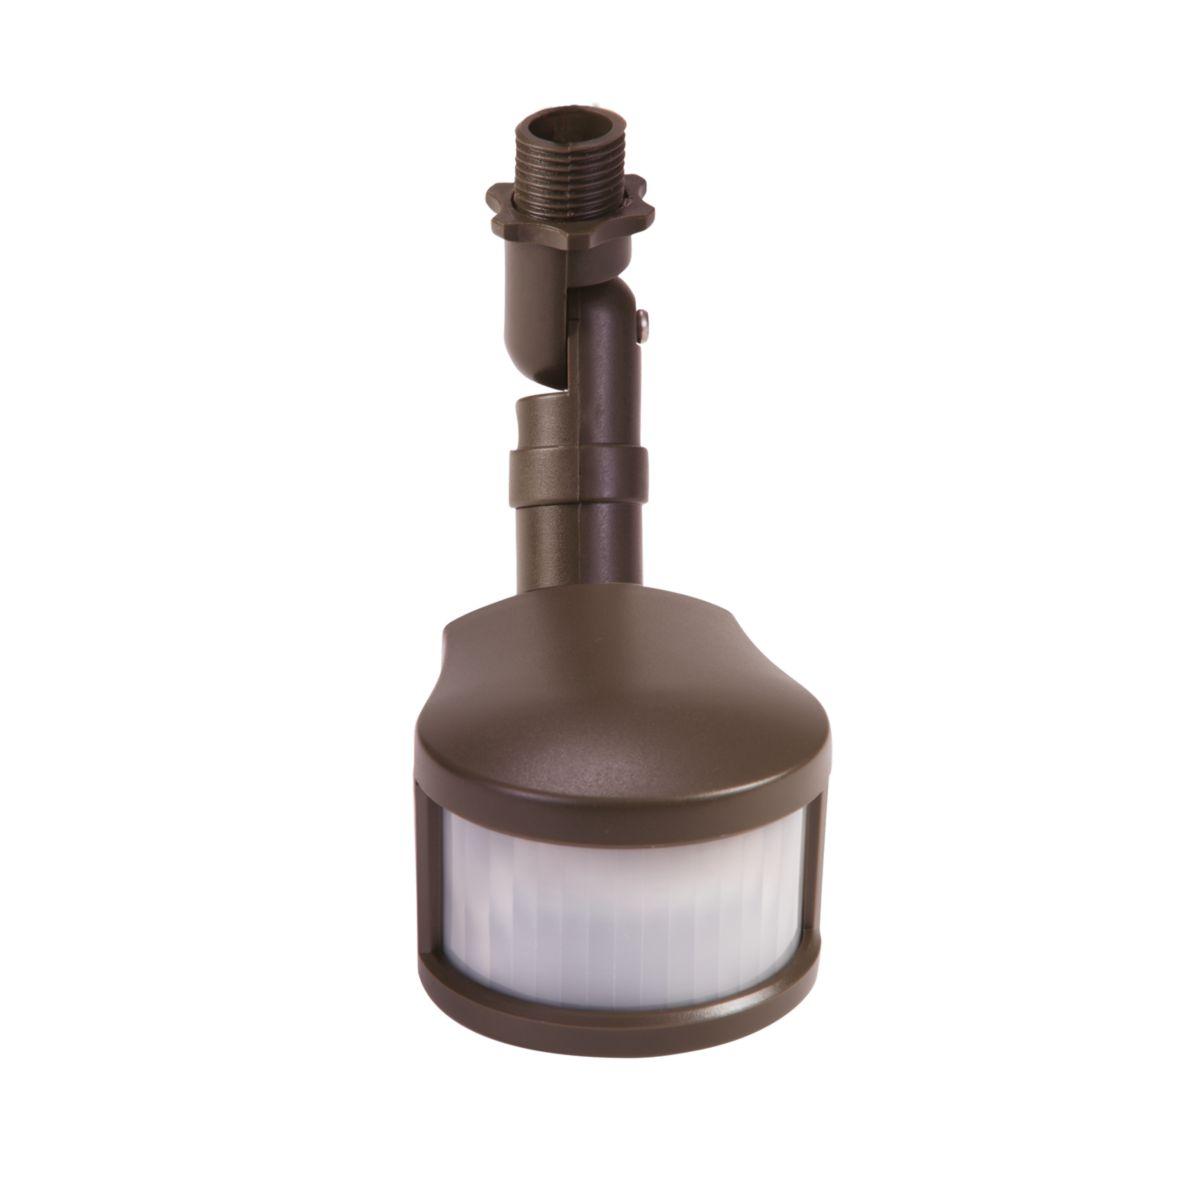 MS180BT Series Bluetooth-enabled Motion Sensor